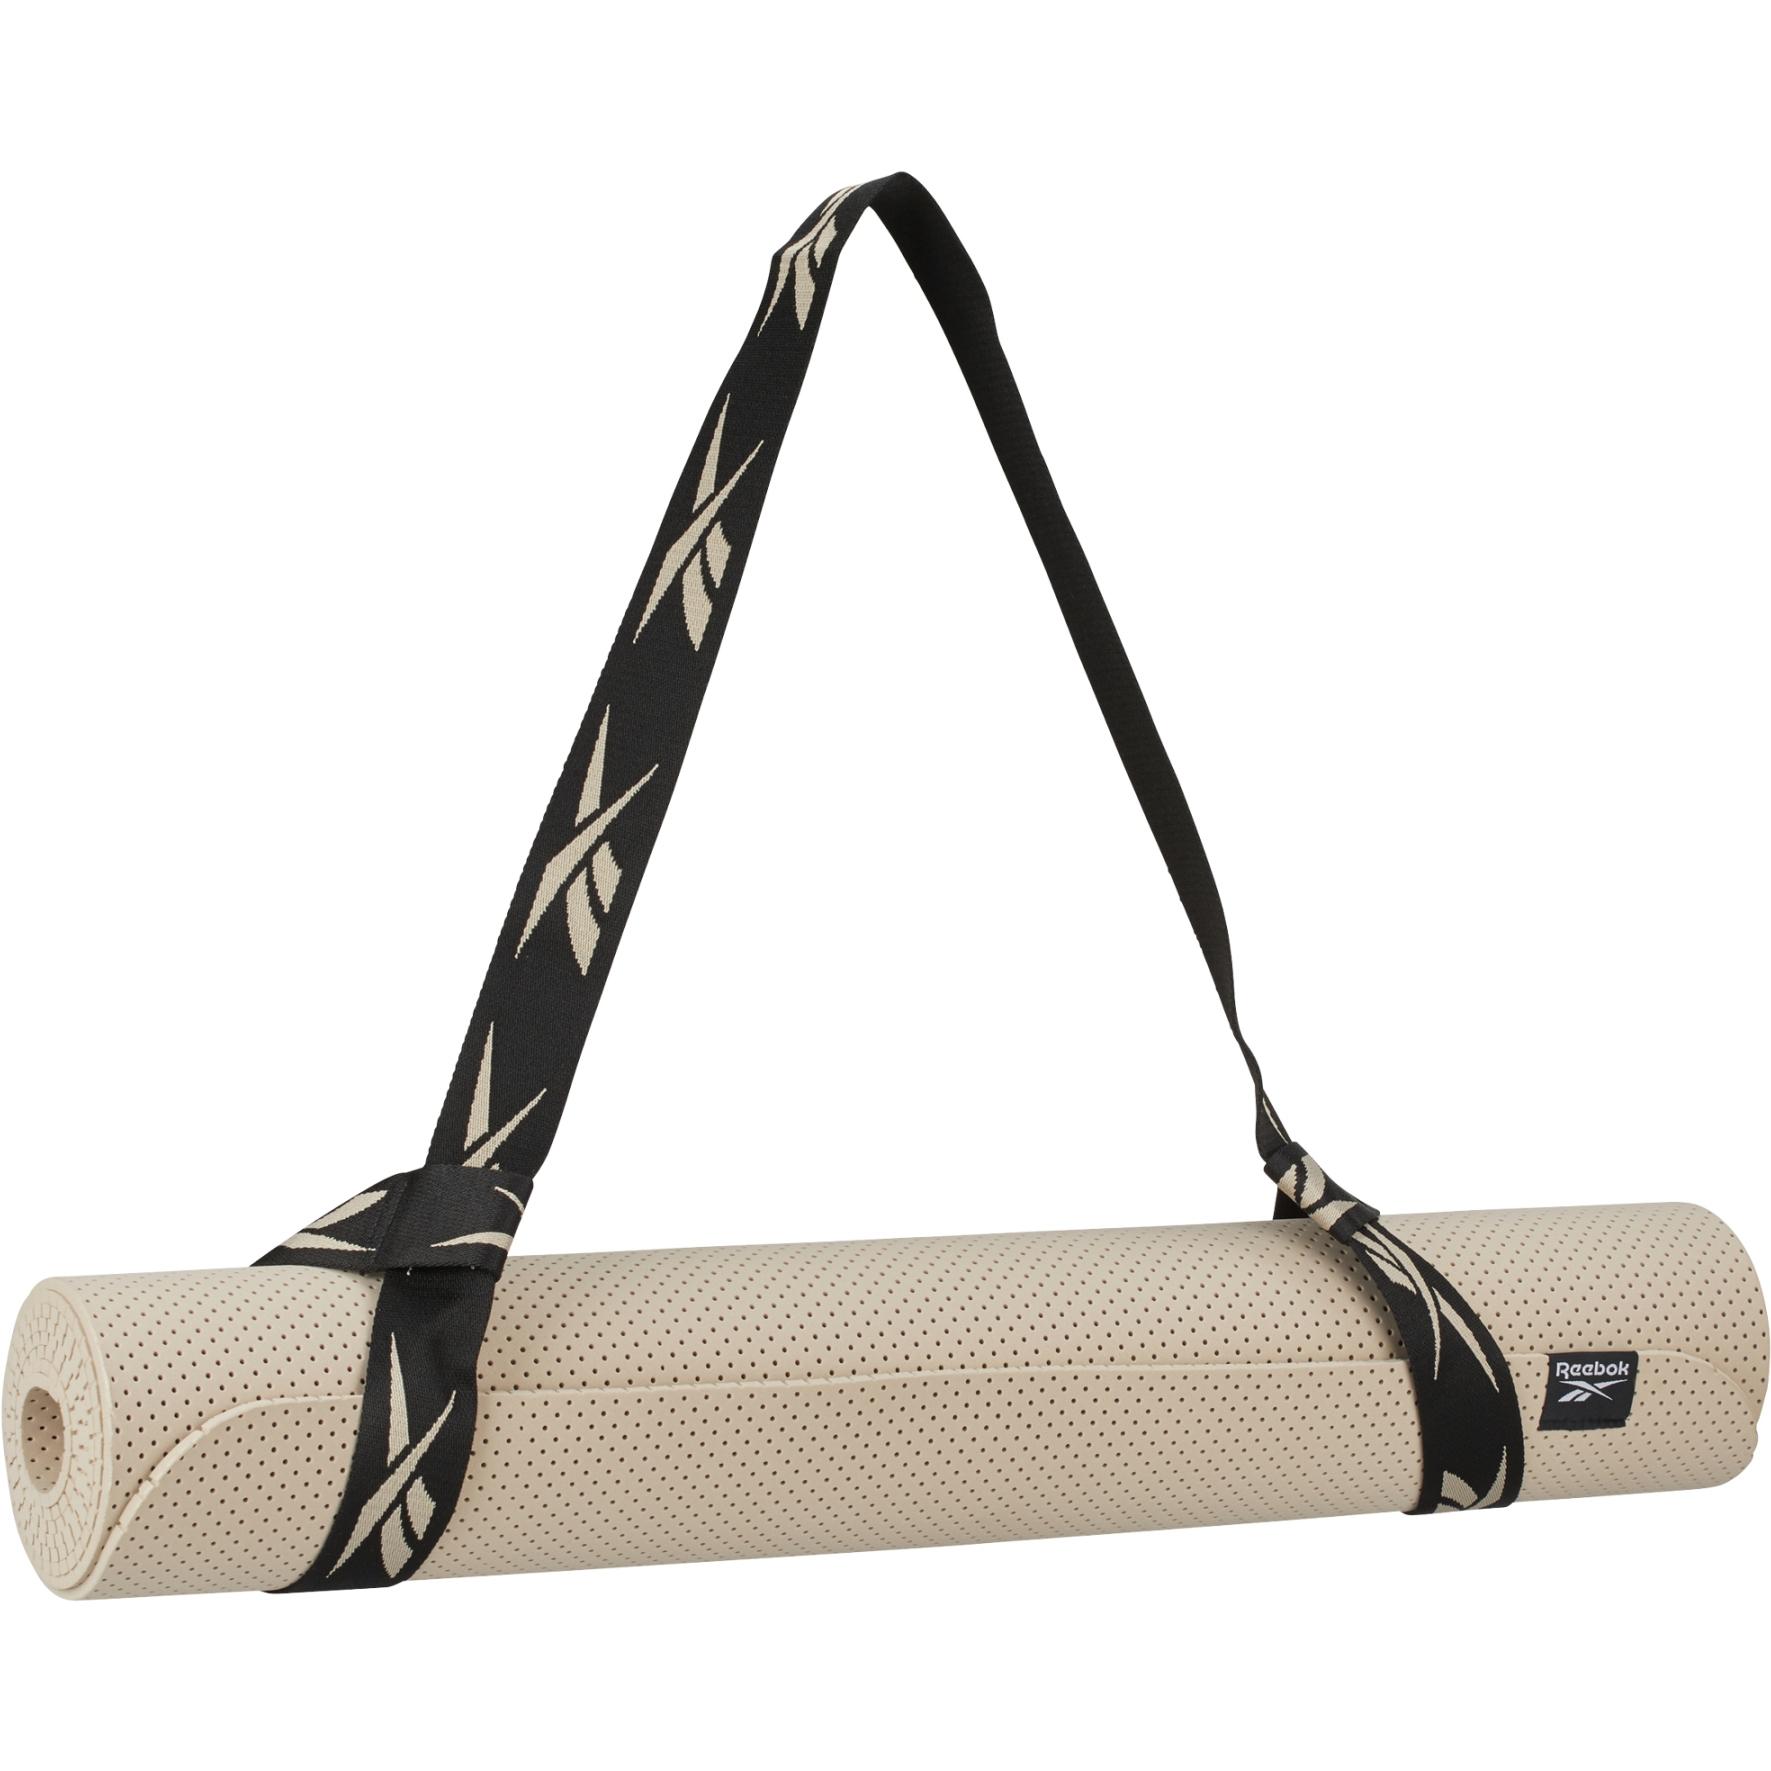 Reebok Tech Style Yoga Mat - modern beige